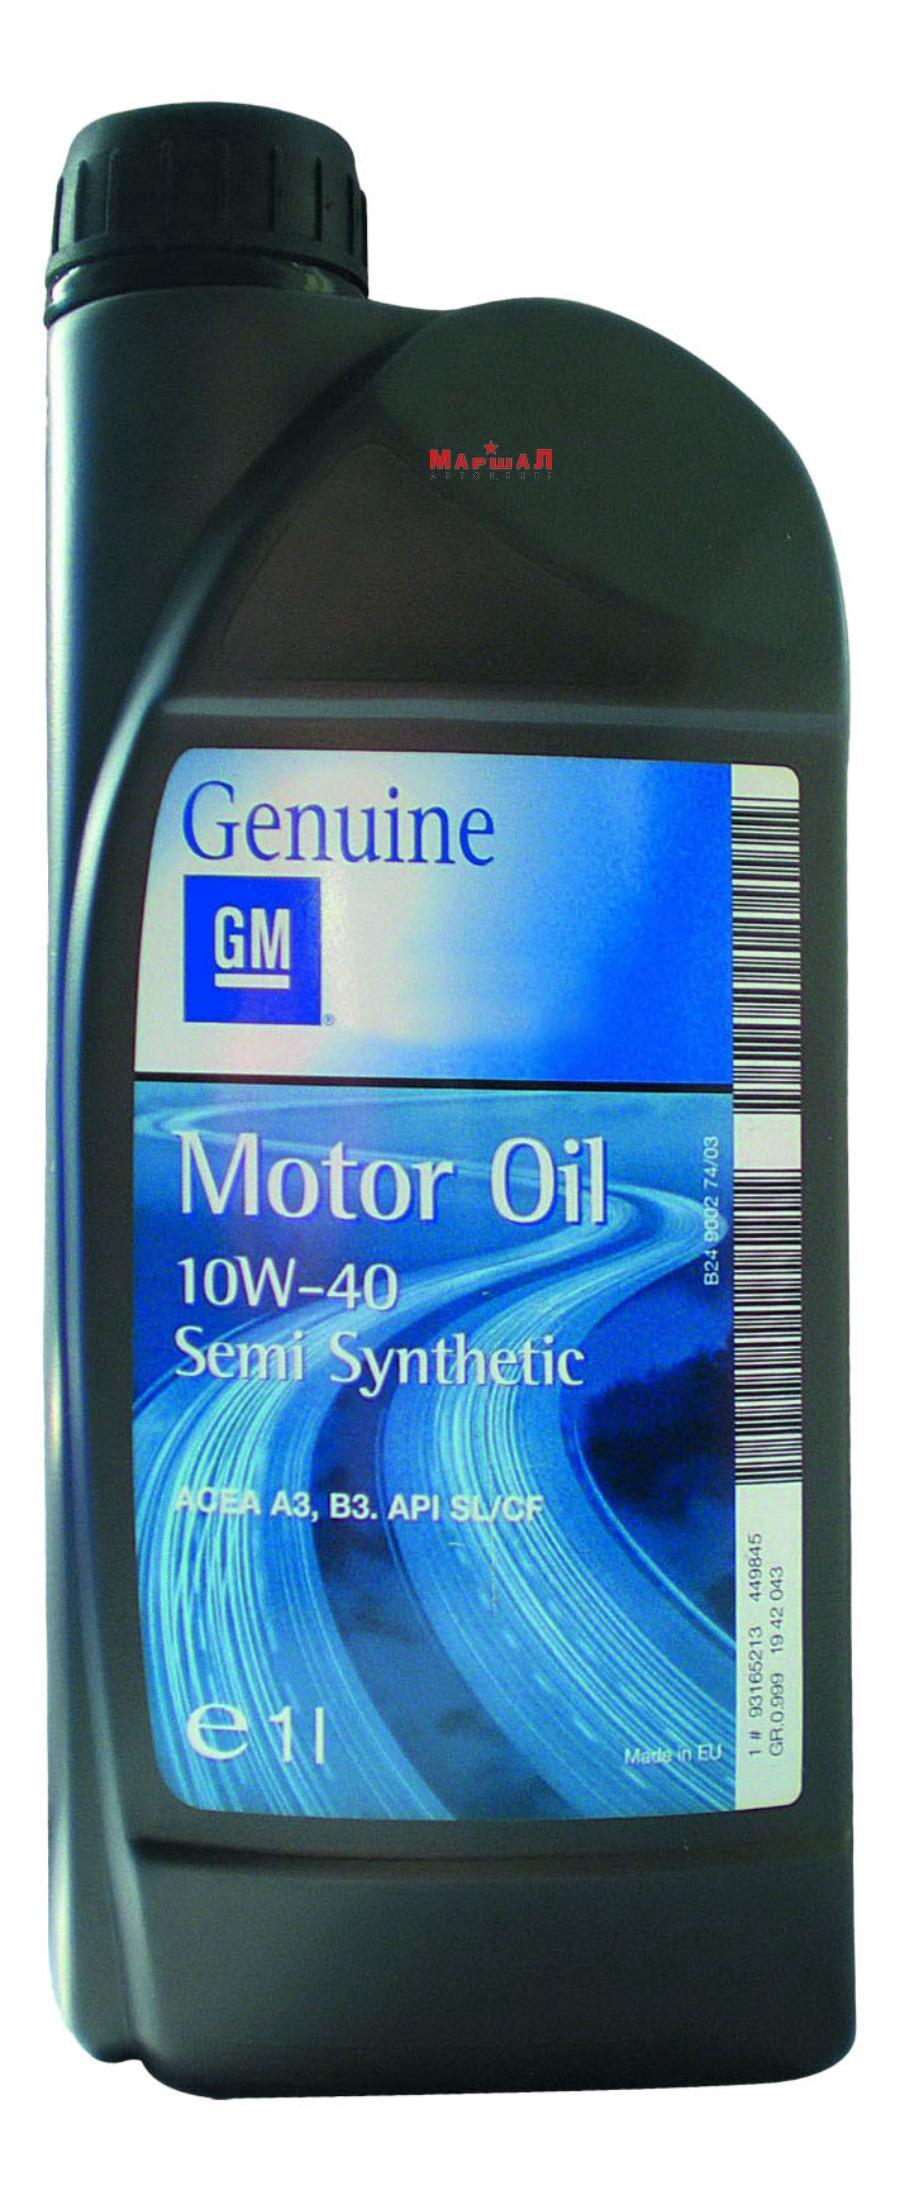 Масло моторное полусинтетическое Semi Synthetic 10W-40, 1л